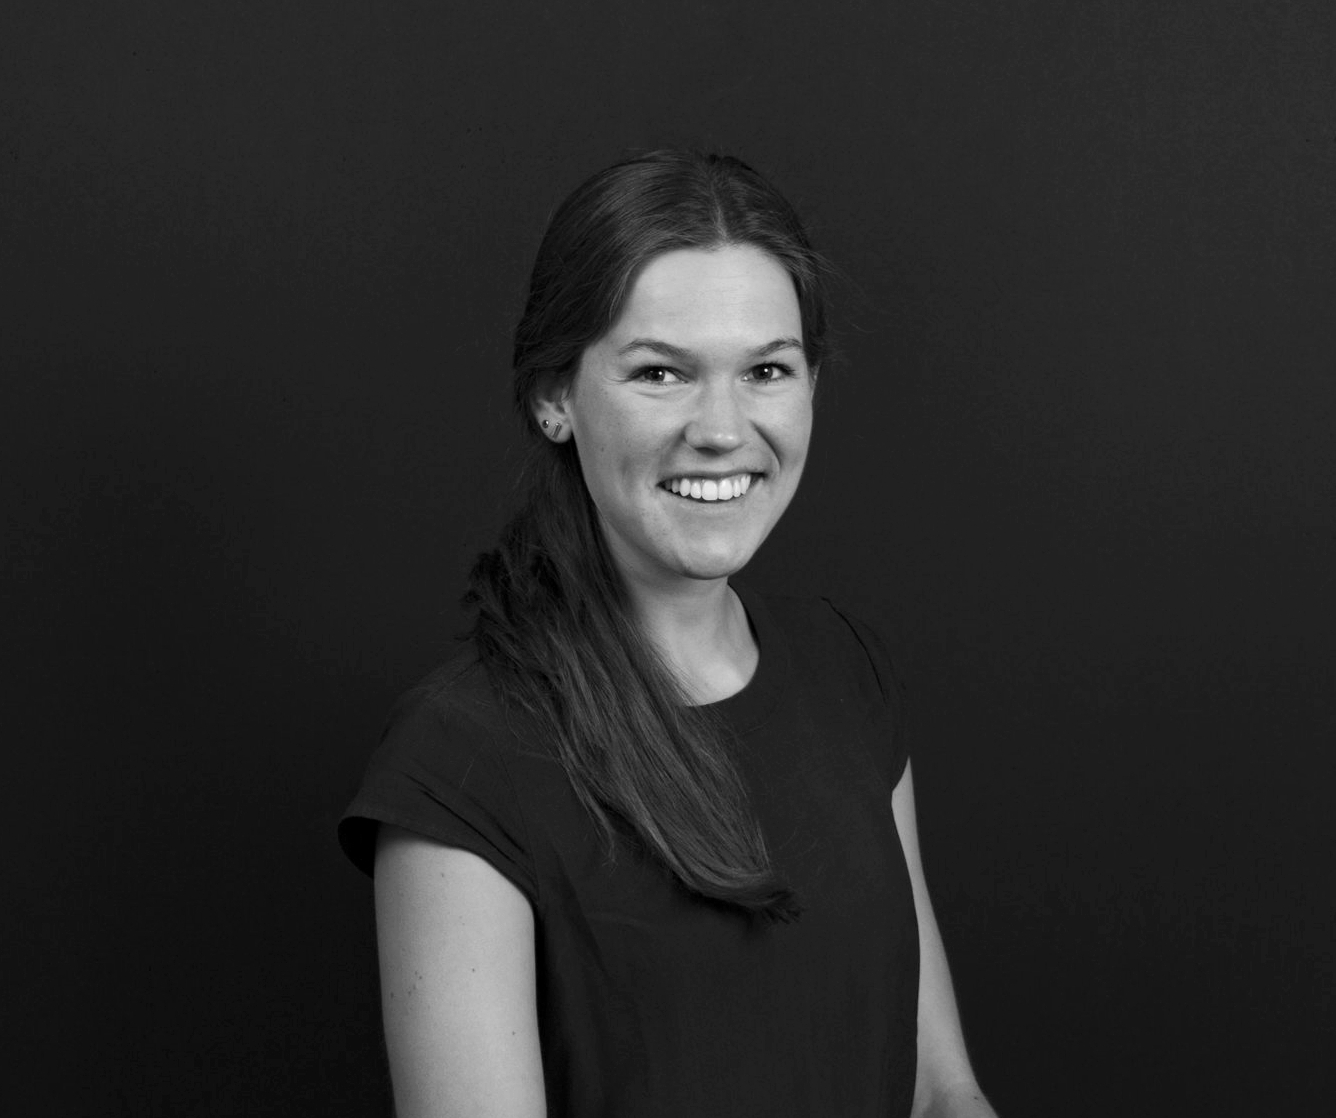 Christiane Lueb